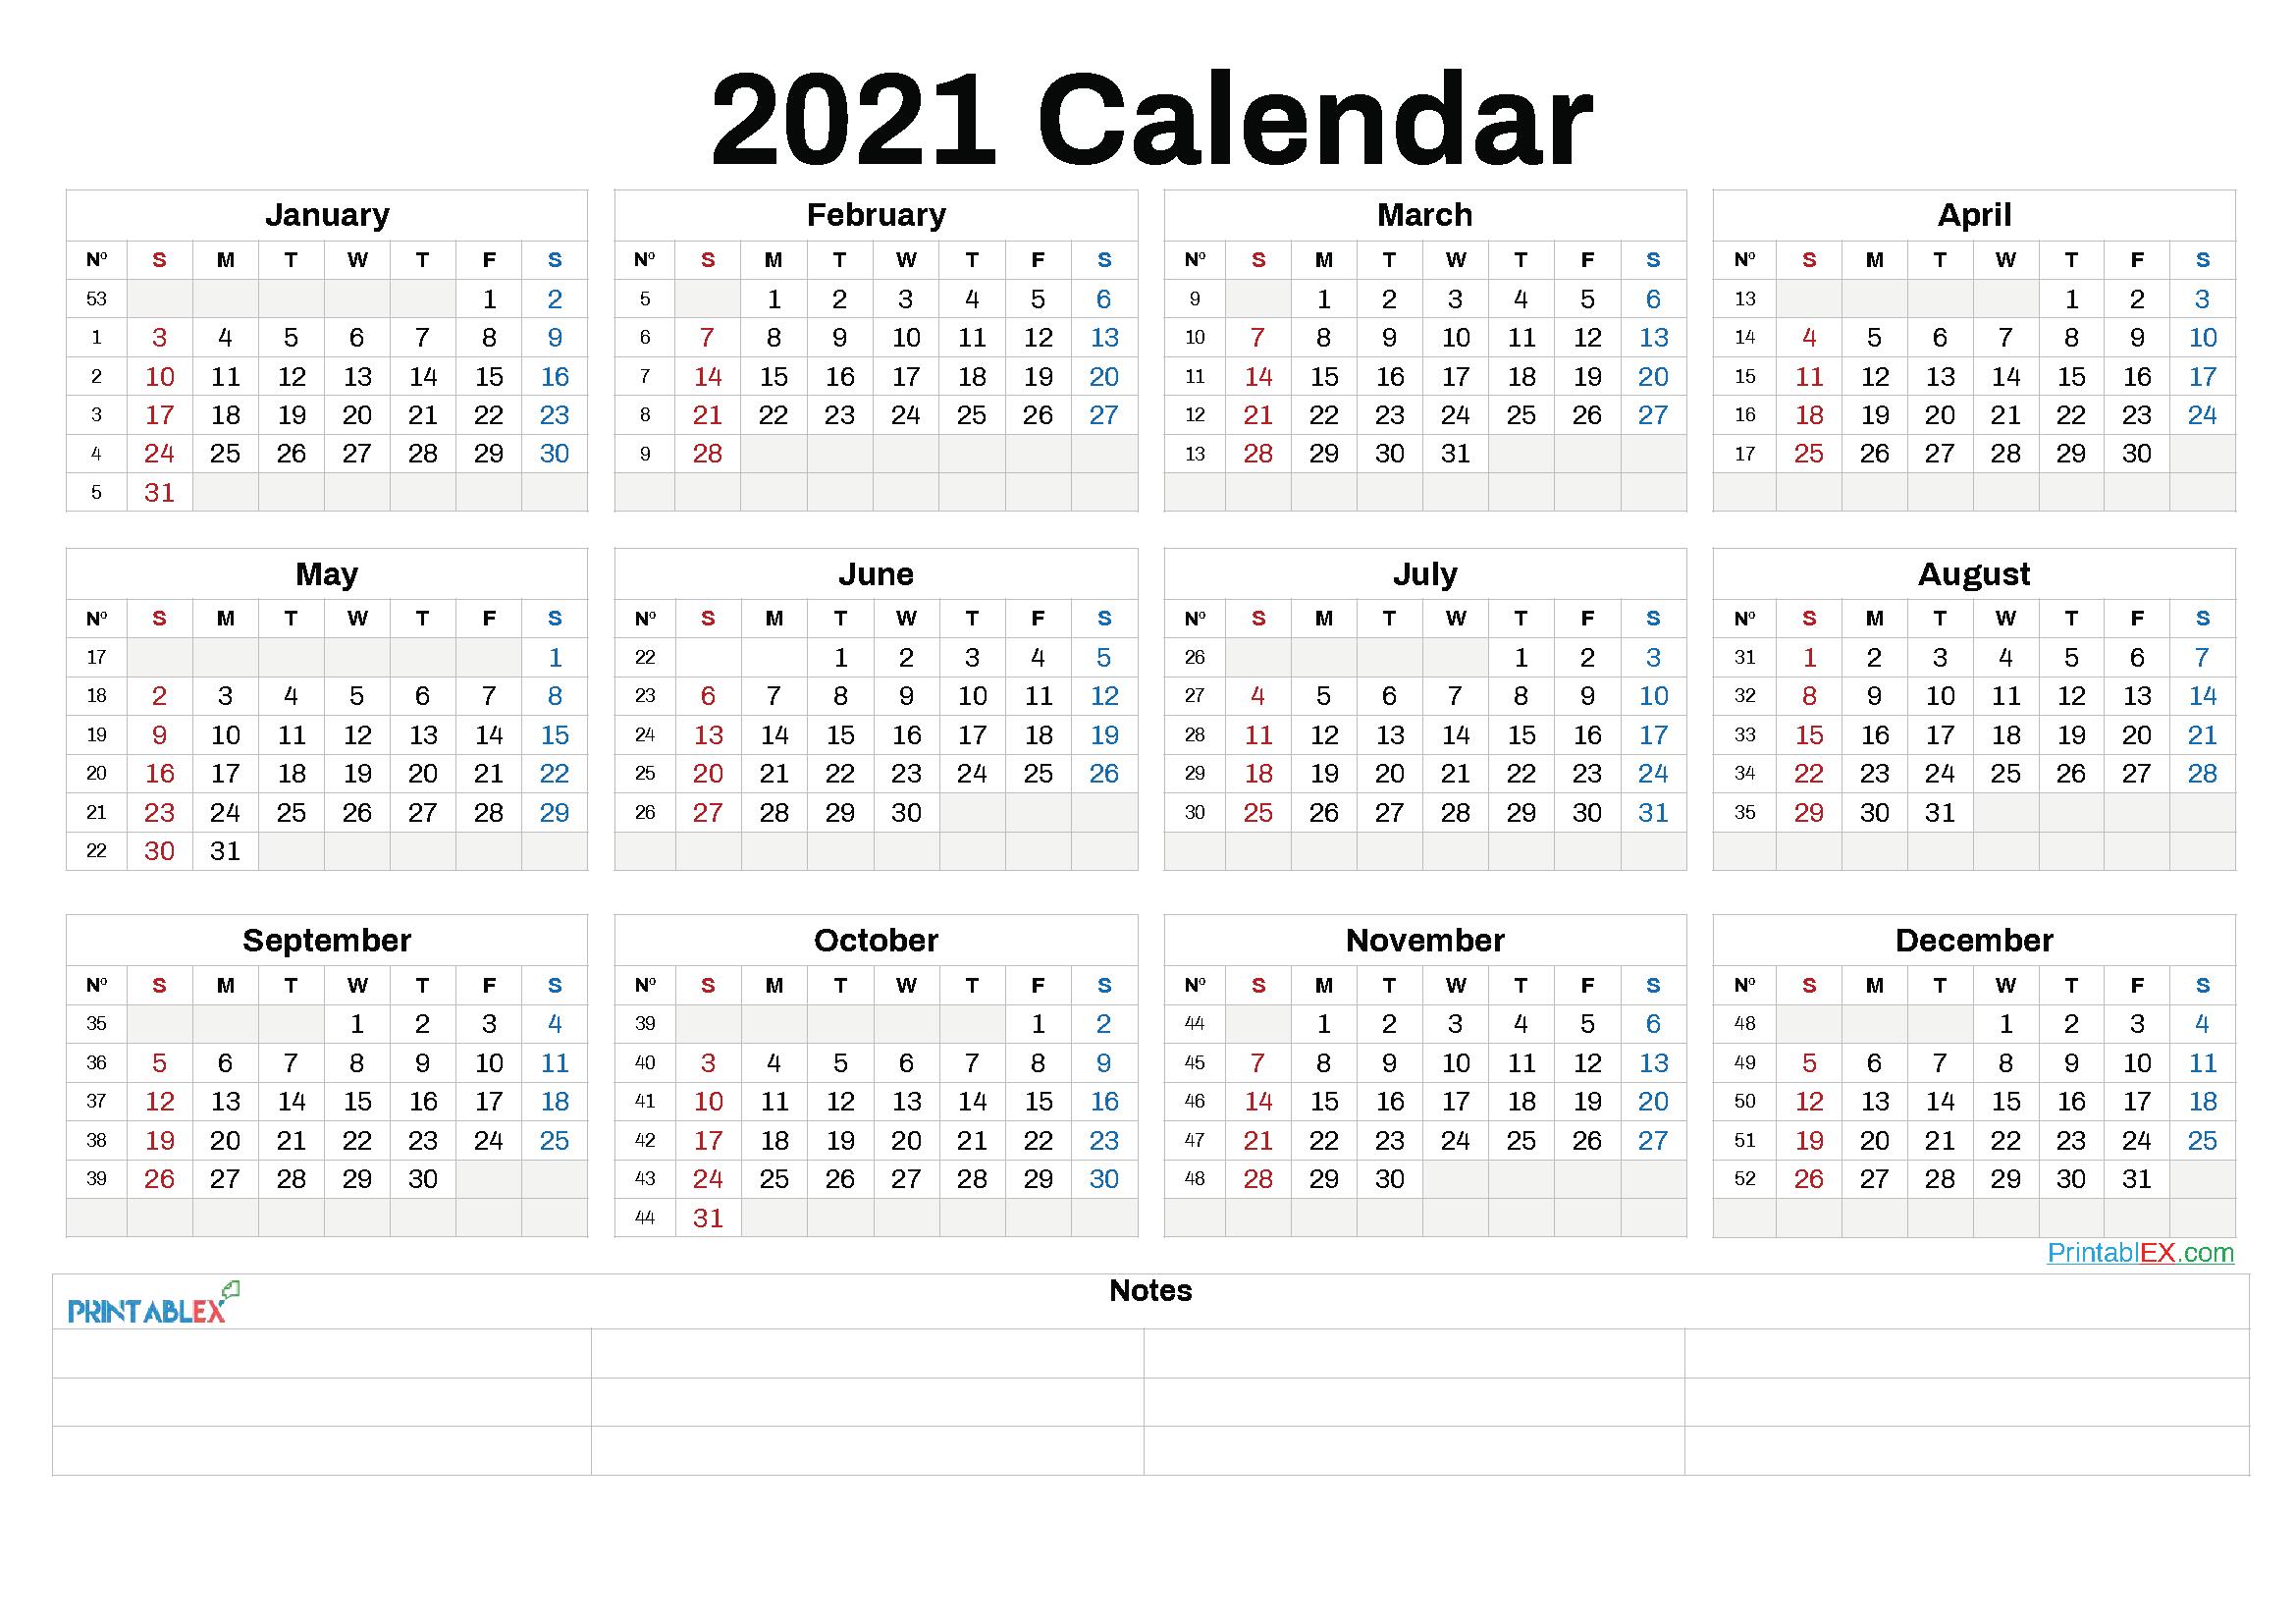 2021 Annual Calendar Printable | 2021 Printable Calendars